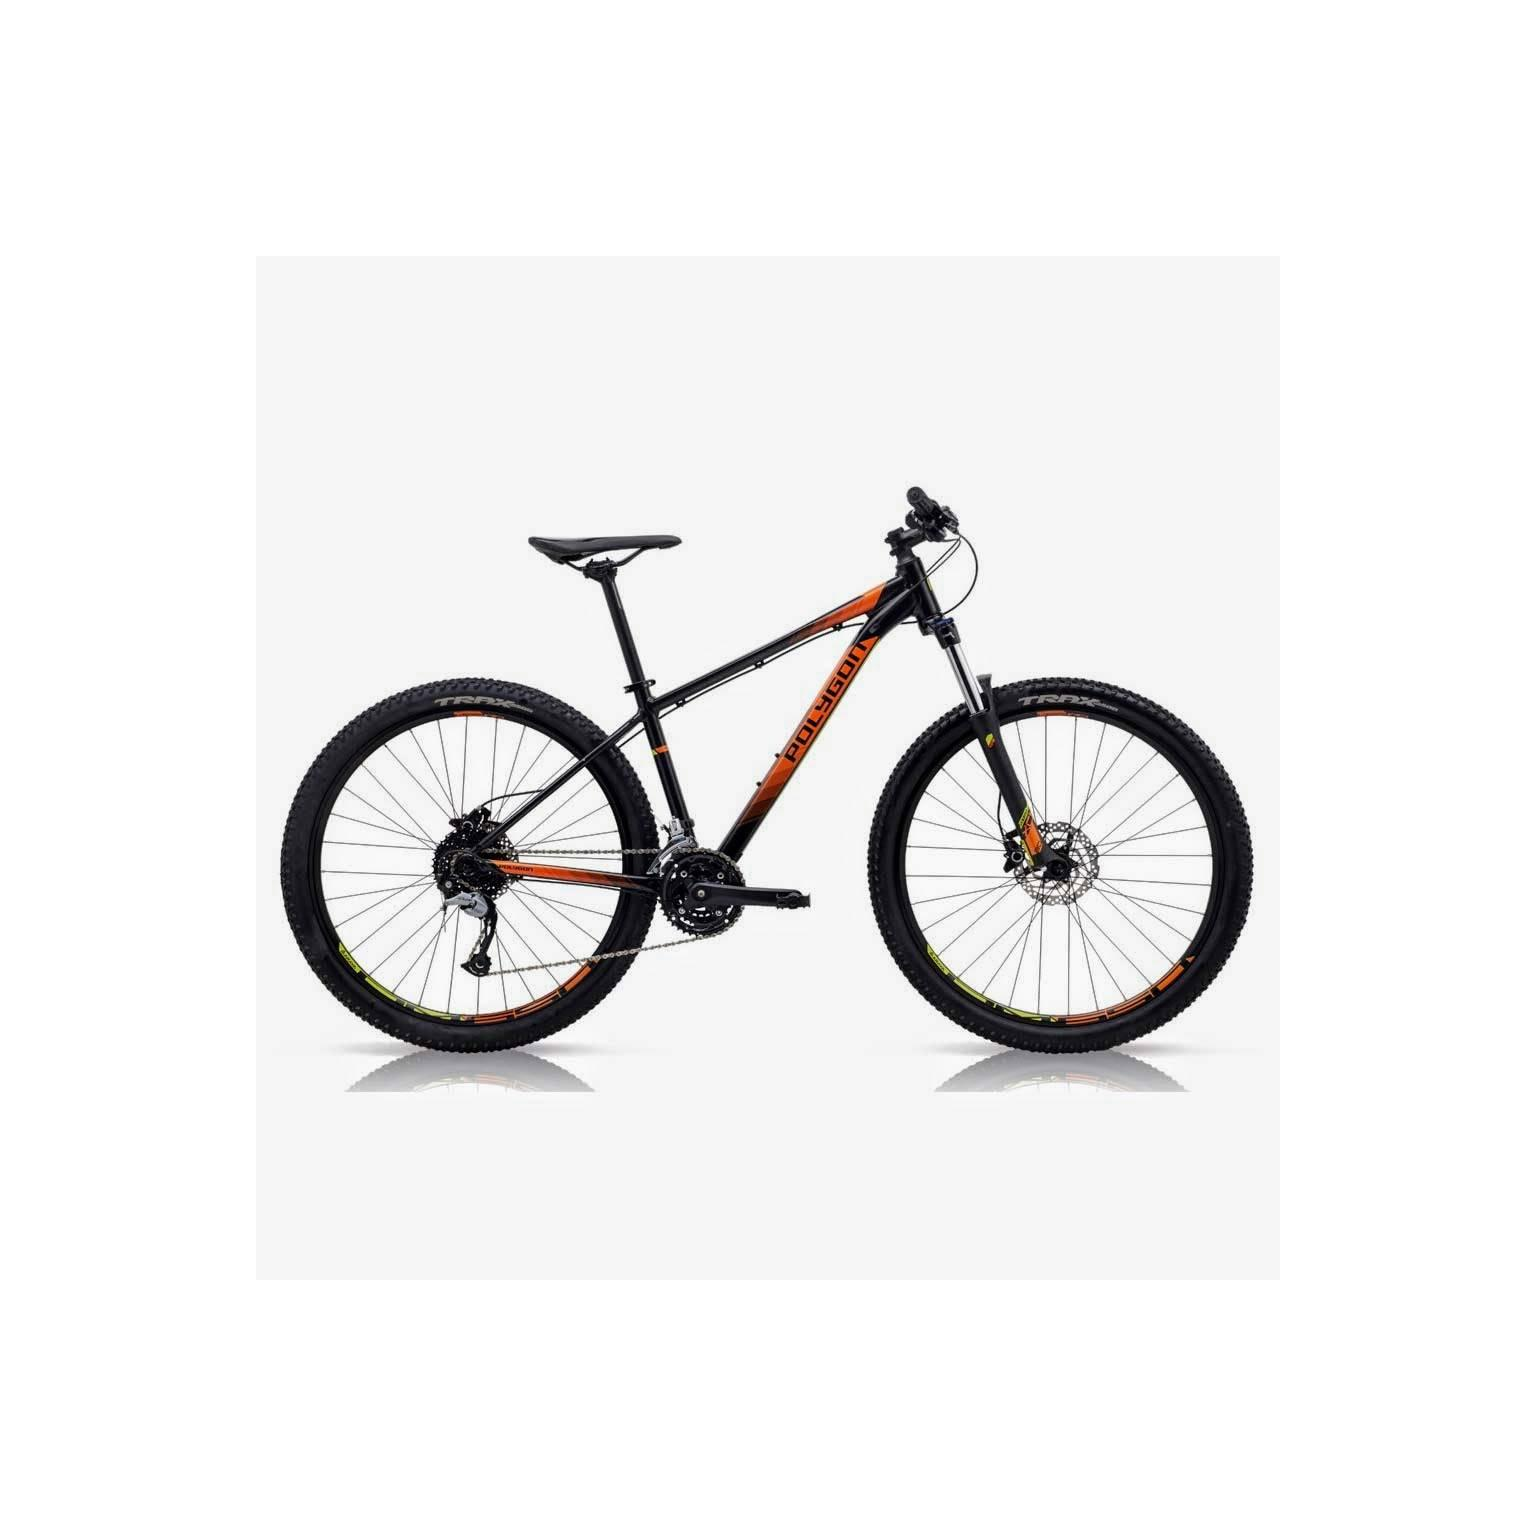 27.5in Polygon Premier 5 AL6 3x9Sp Cakram Hidraulis Sepeda Gunung XC